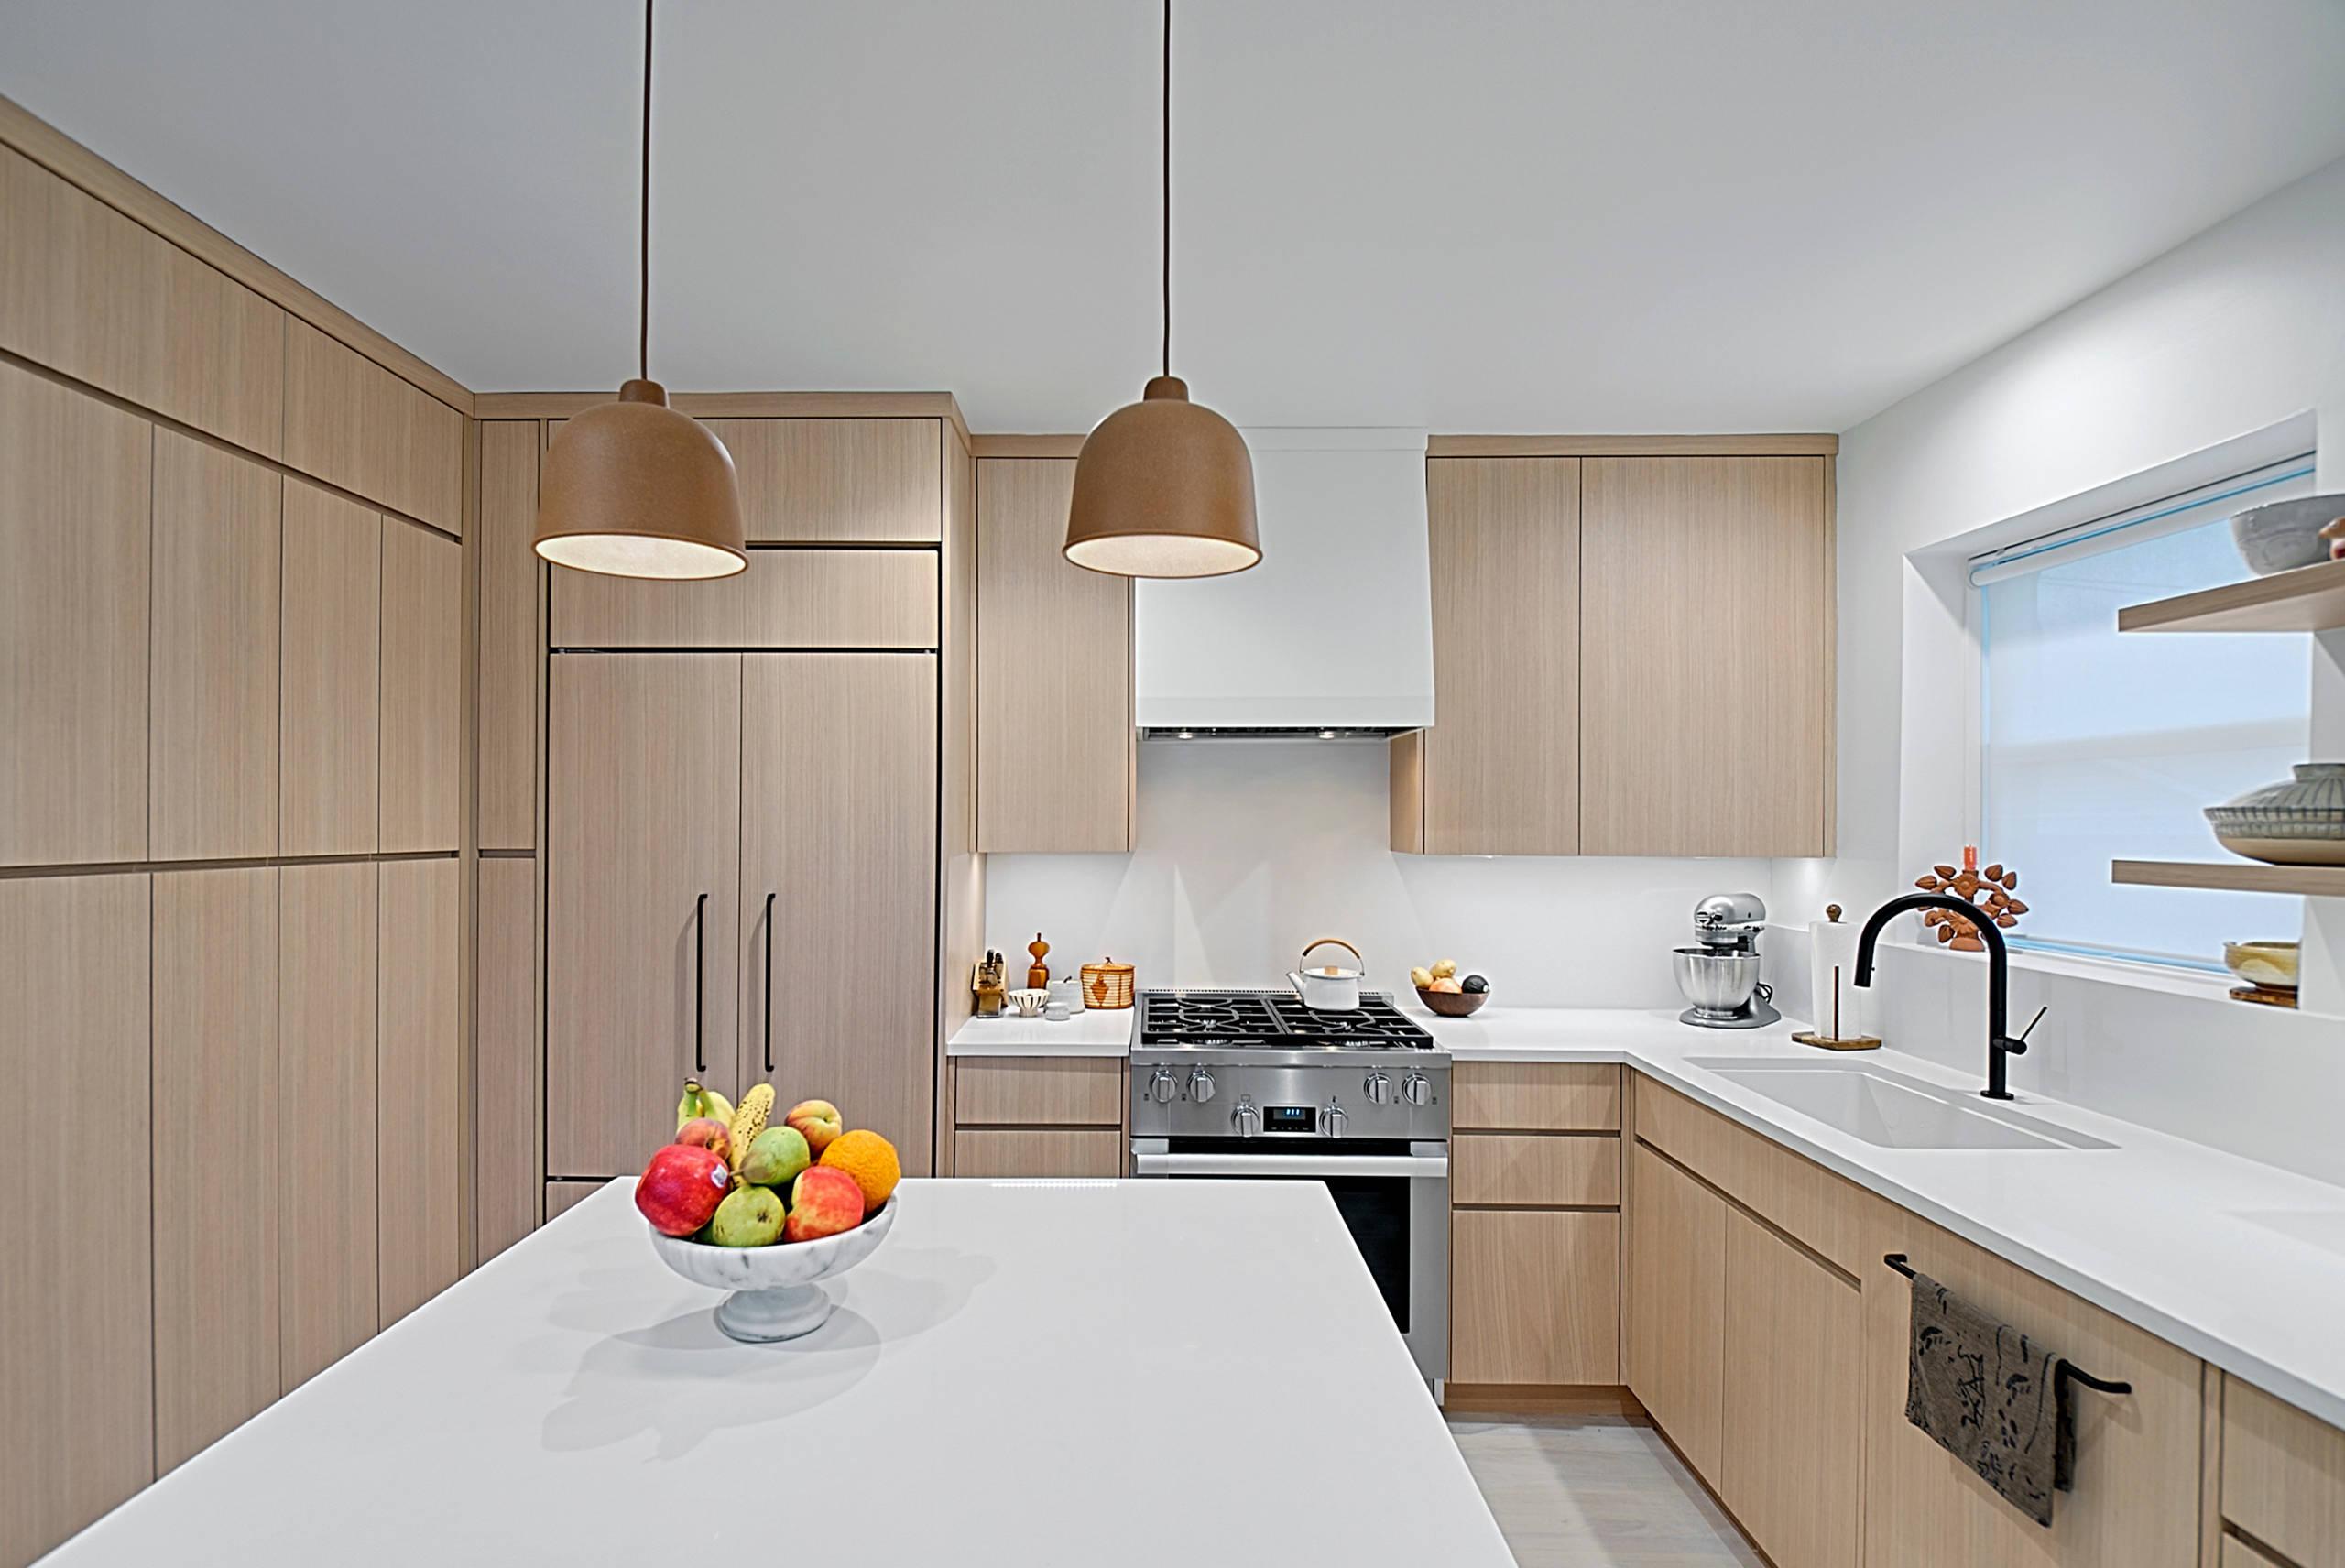 100 Modern and Contemporary Kitchen Design Ideas